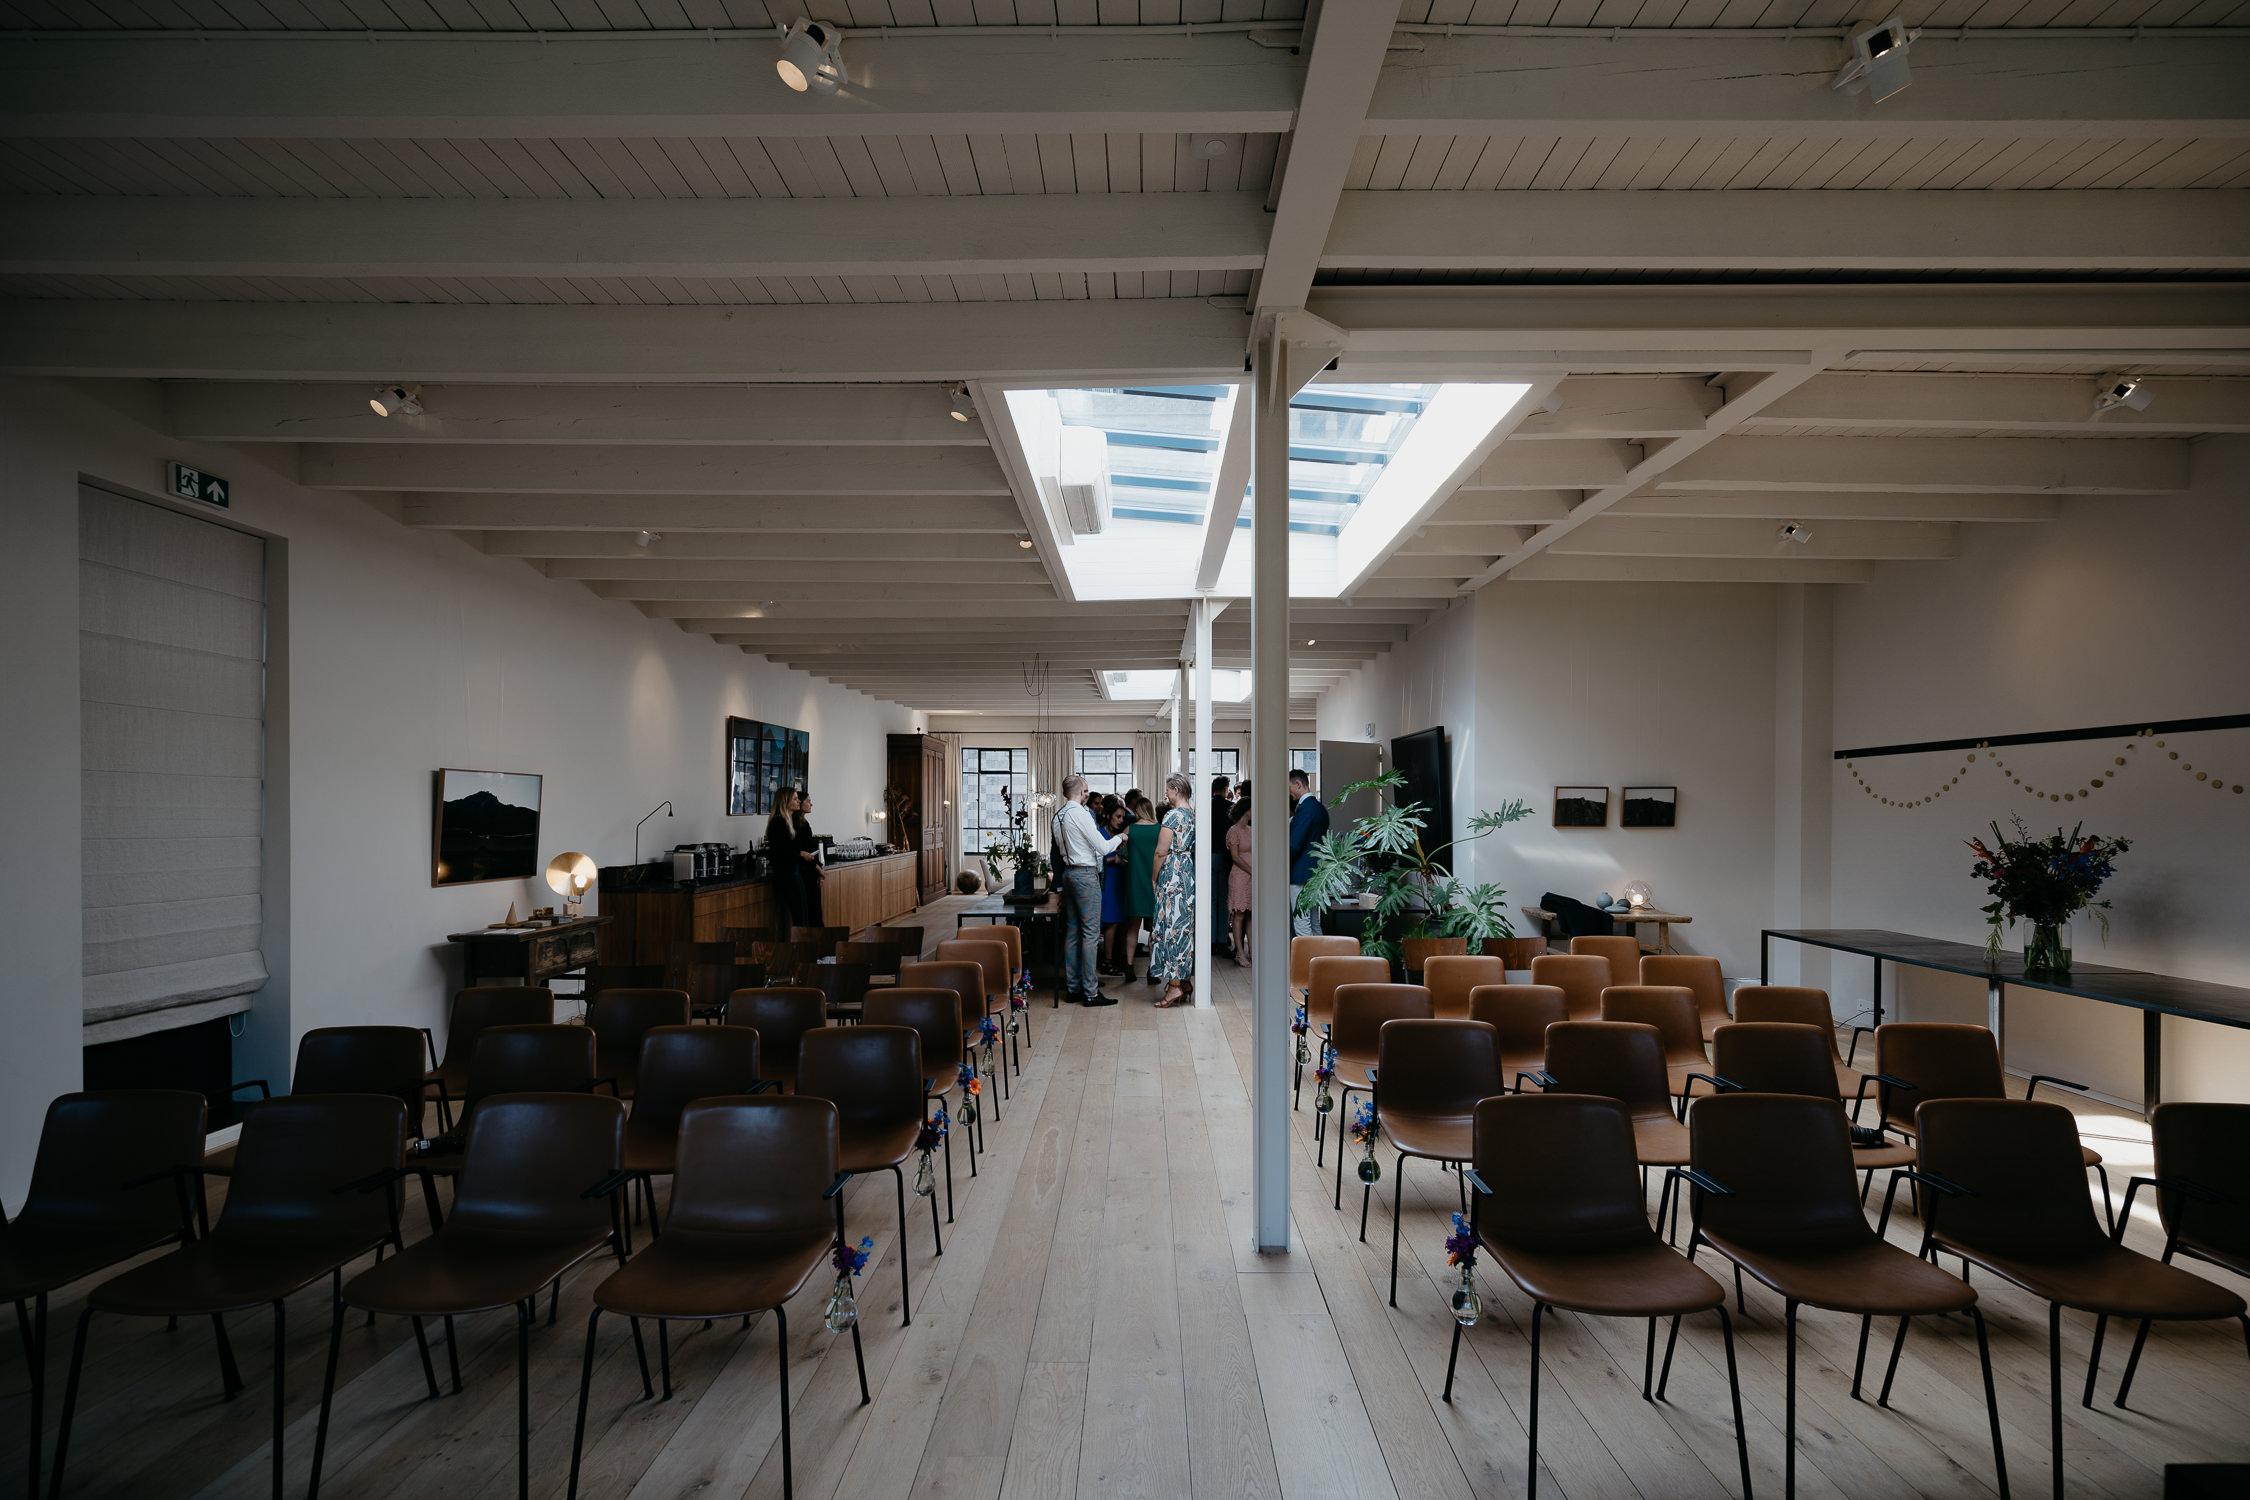 Wedding venue in amsterdam by mark hadden photography